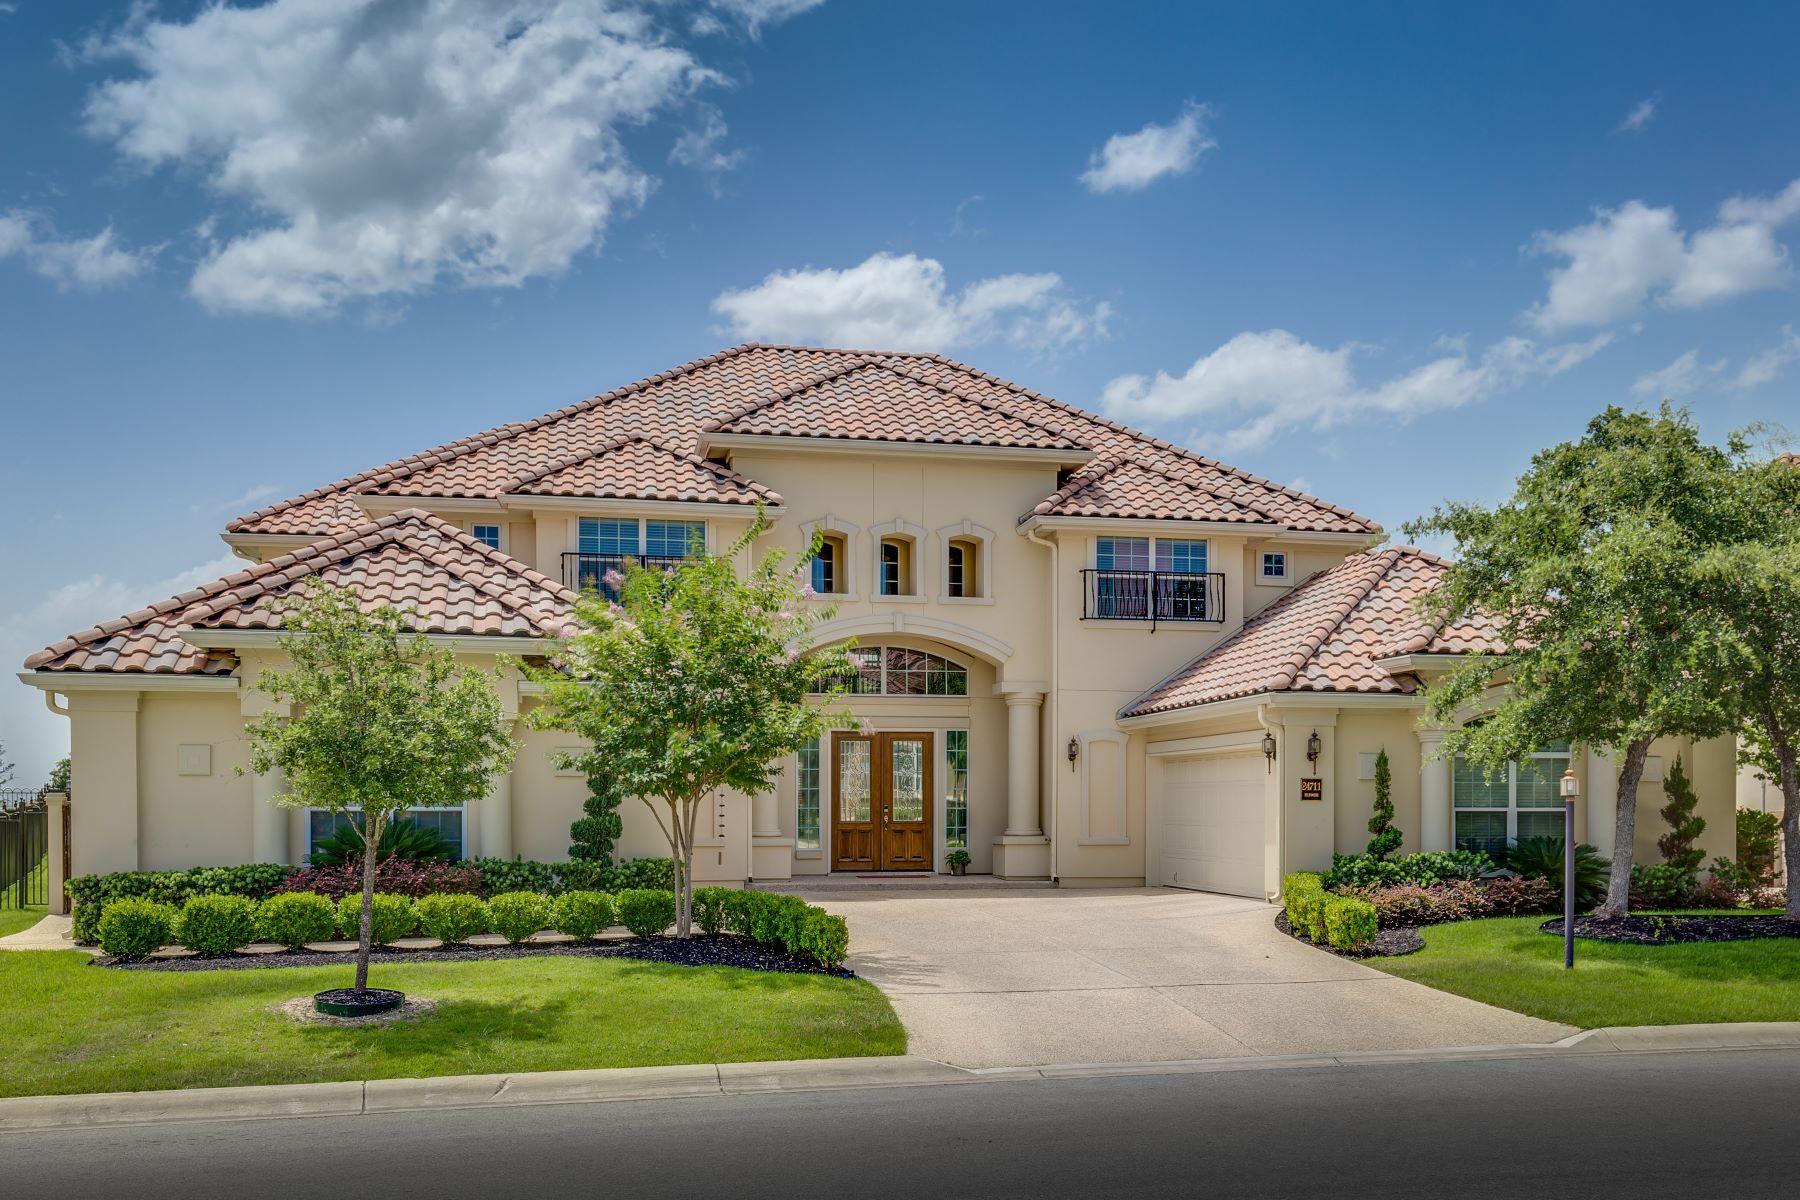 Single Family Home for Sale at Italian Villa in The Dominion 24711 Ellesmere, San Antonio, Texas, 78257 United States